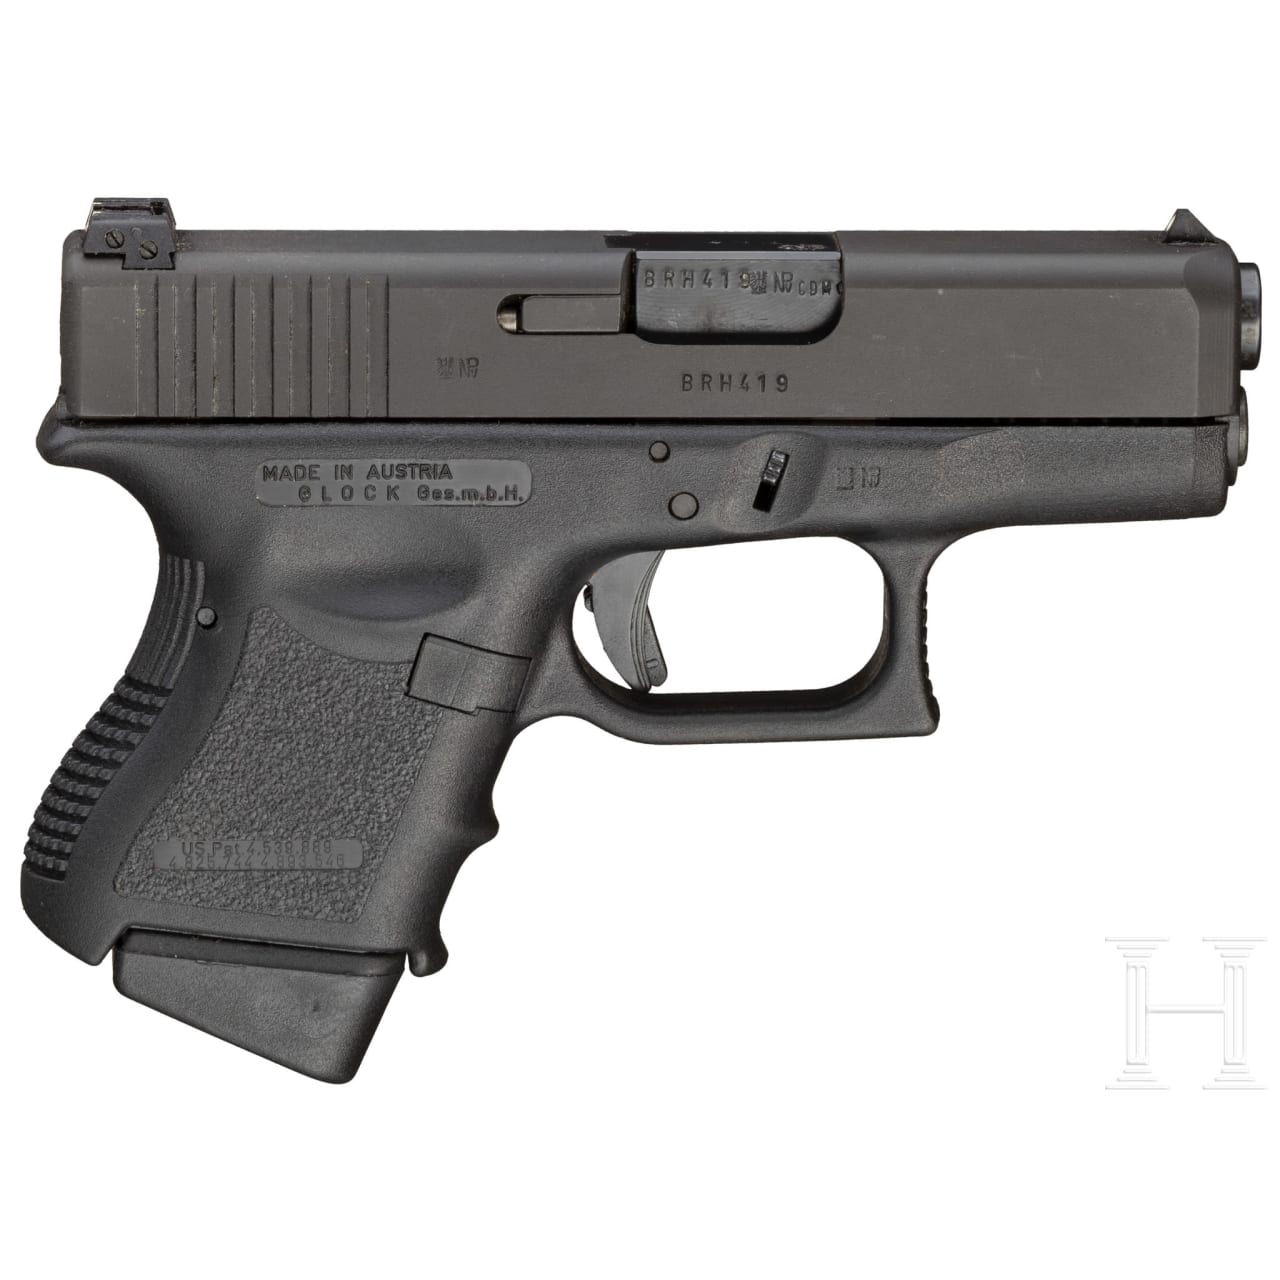 Glock Mod. 26, 4 mm M20 Umbau, in Box